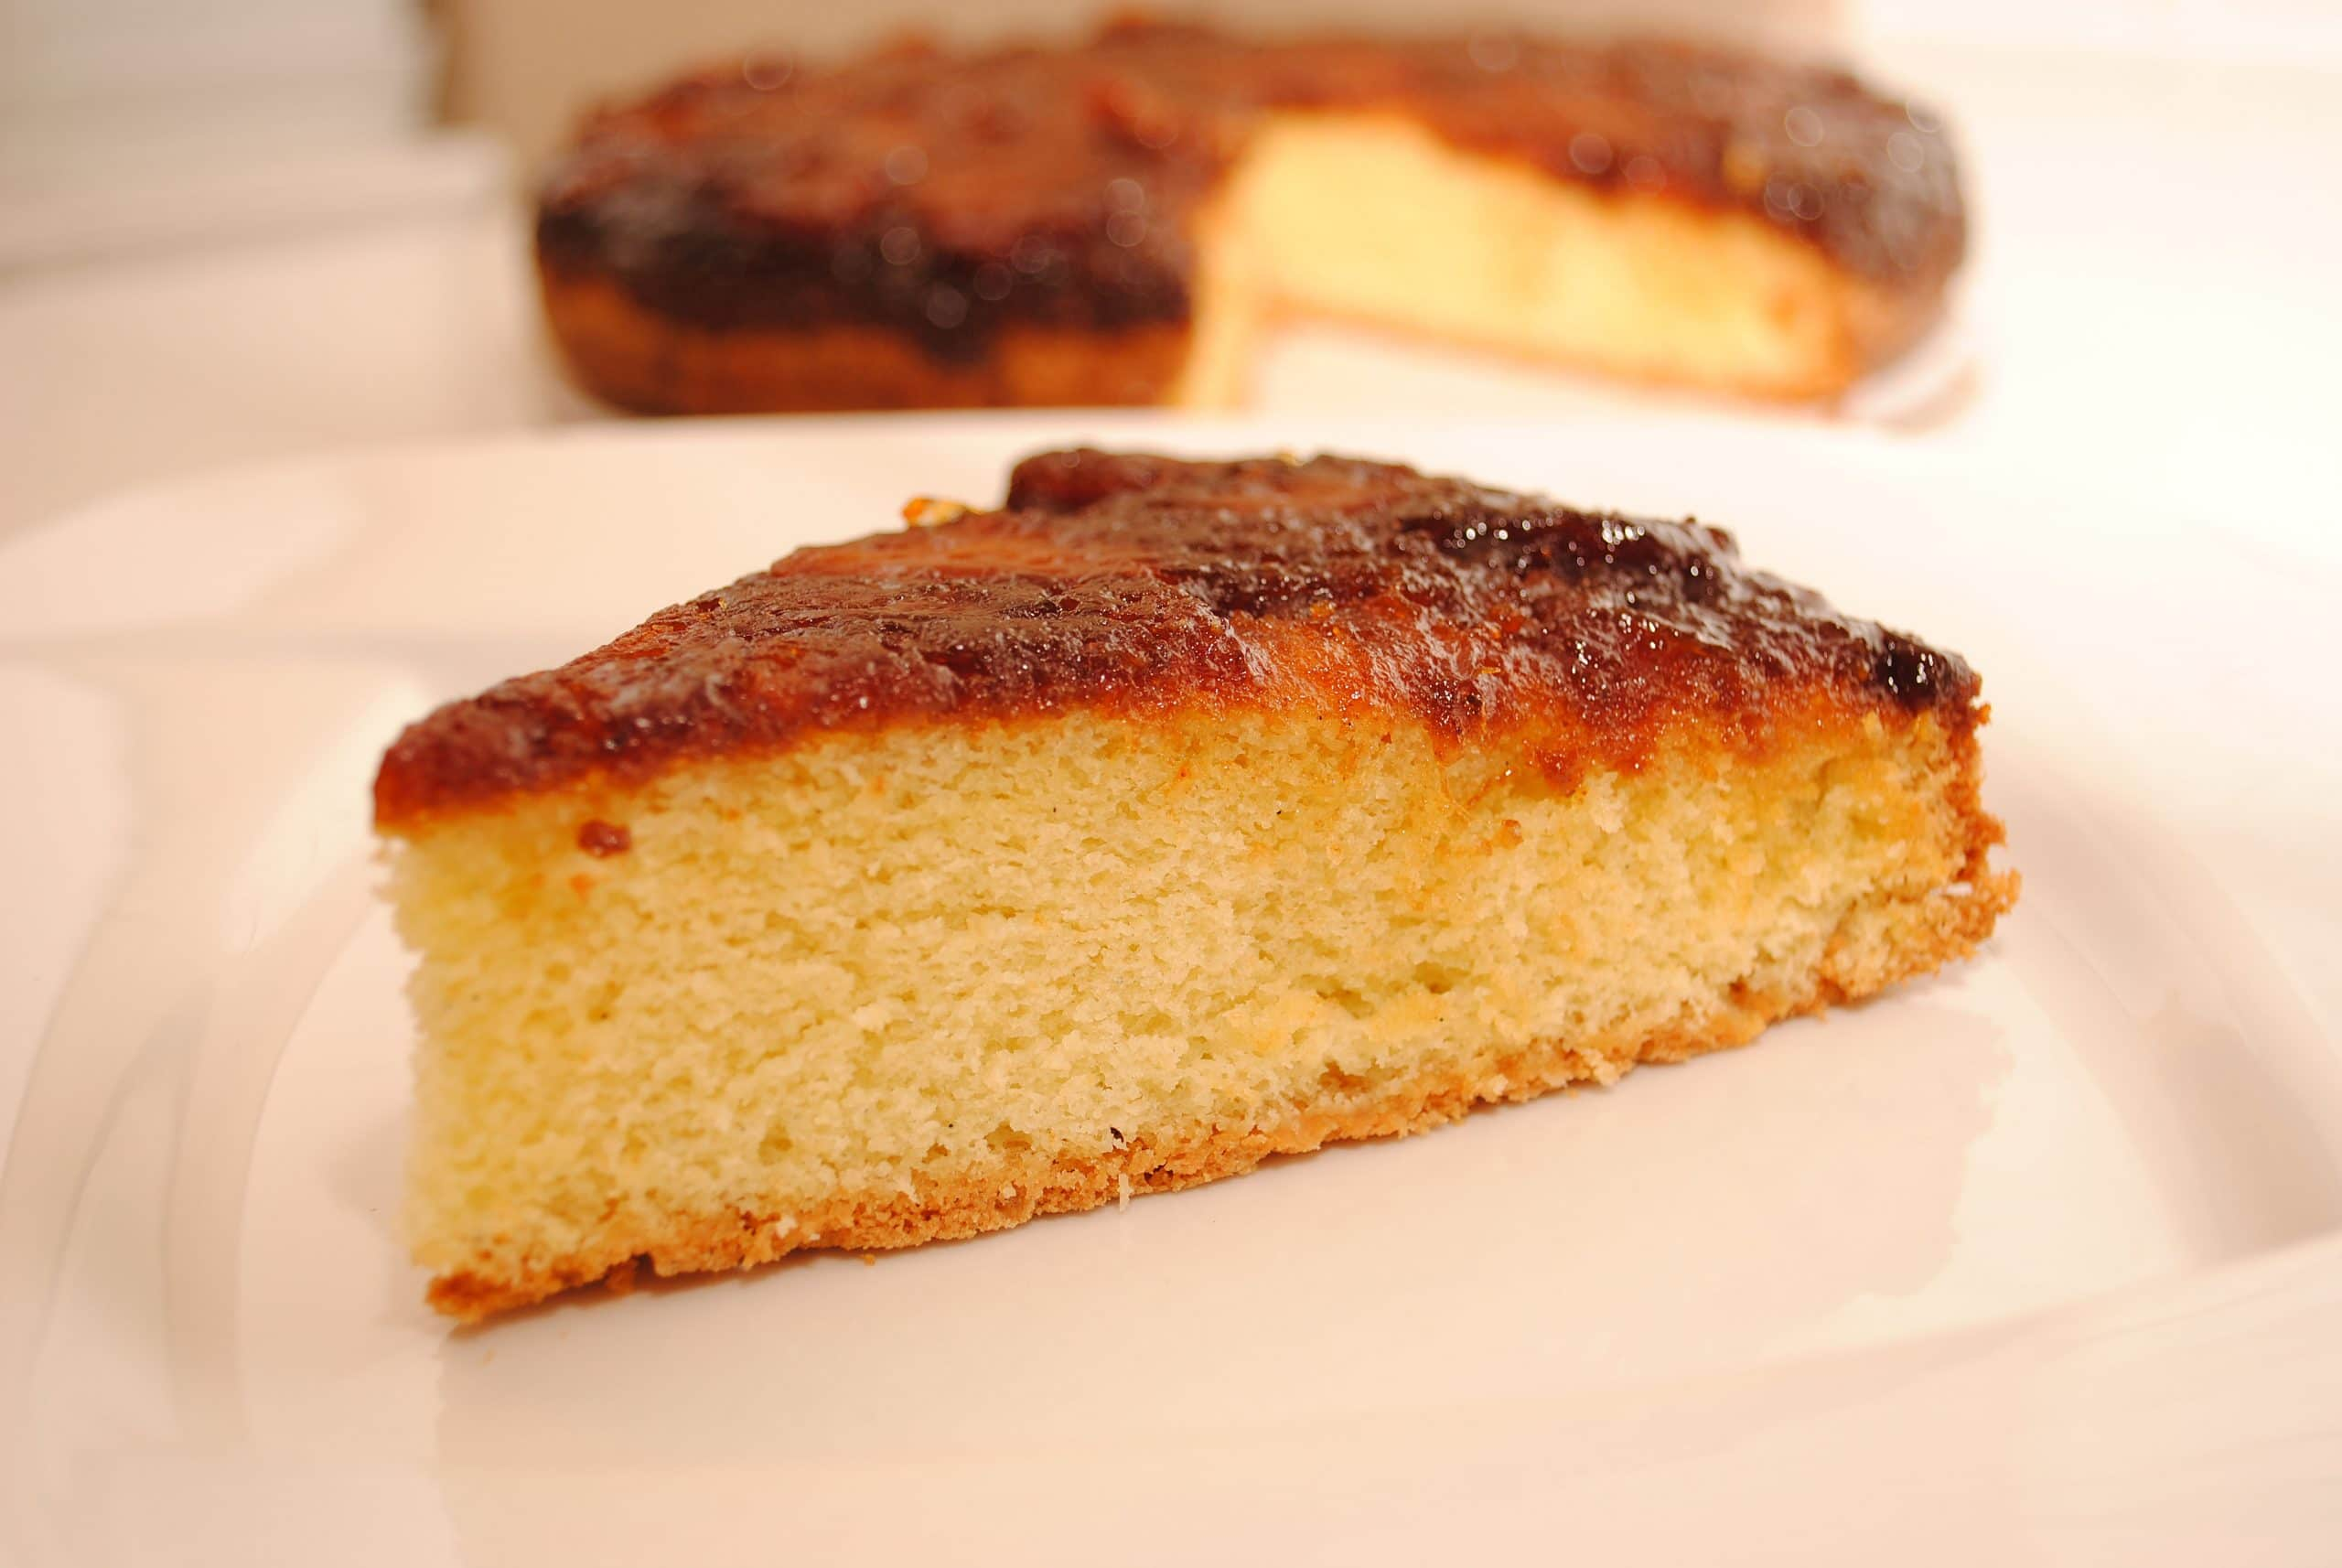 Carmelized Pineapple Upside Down Cake